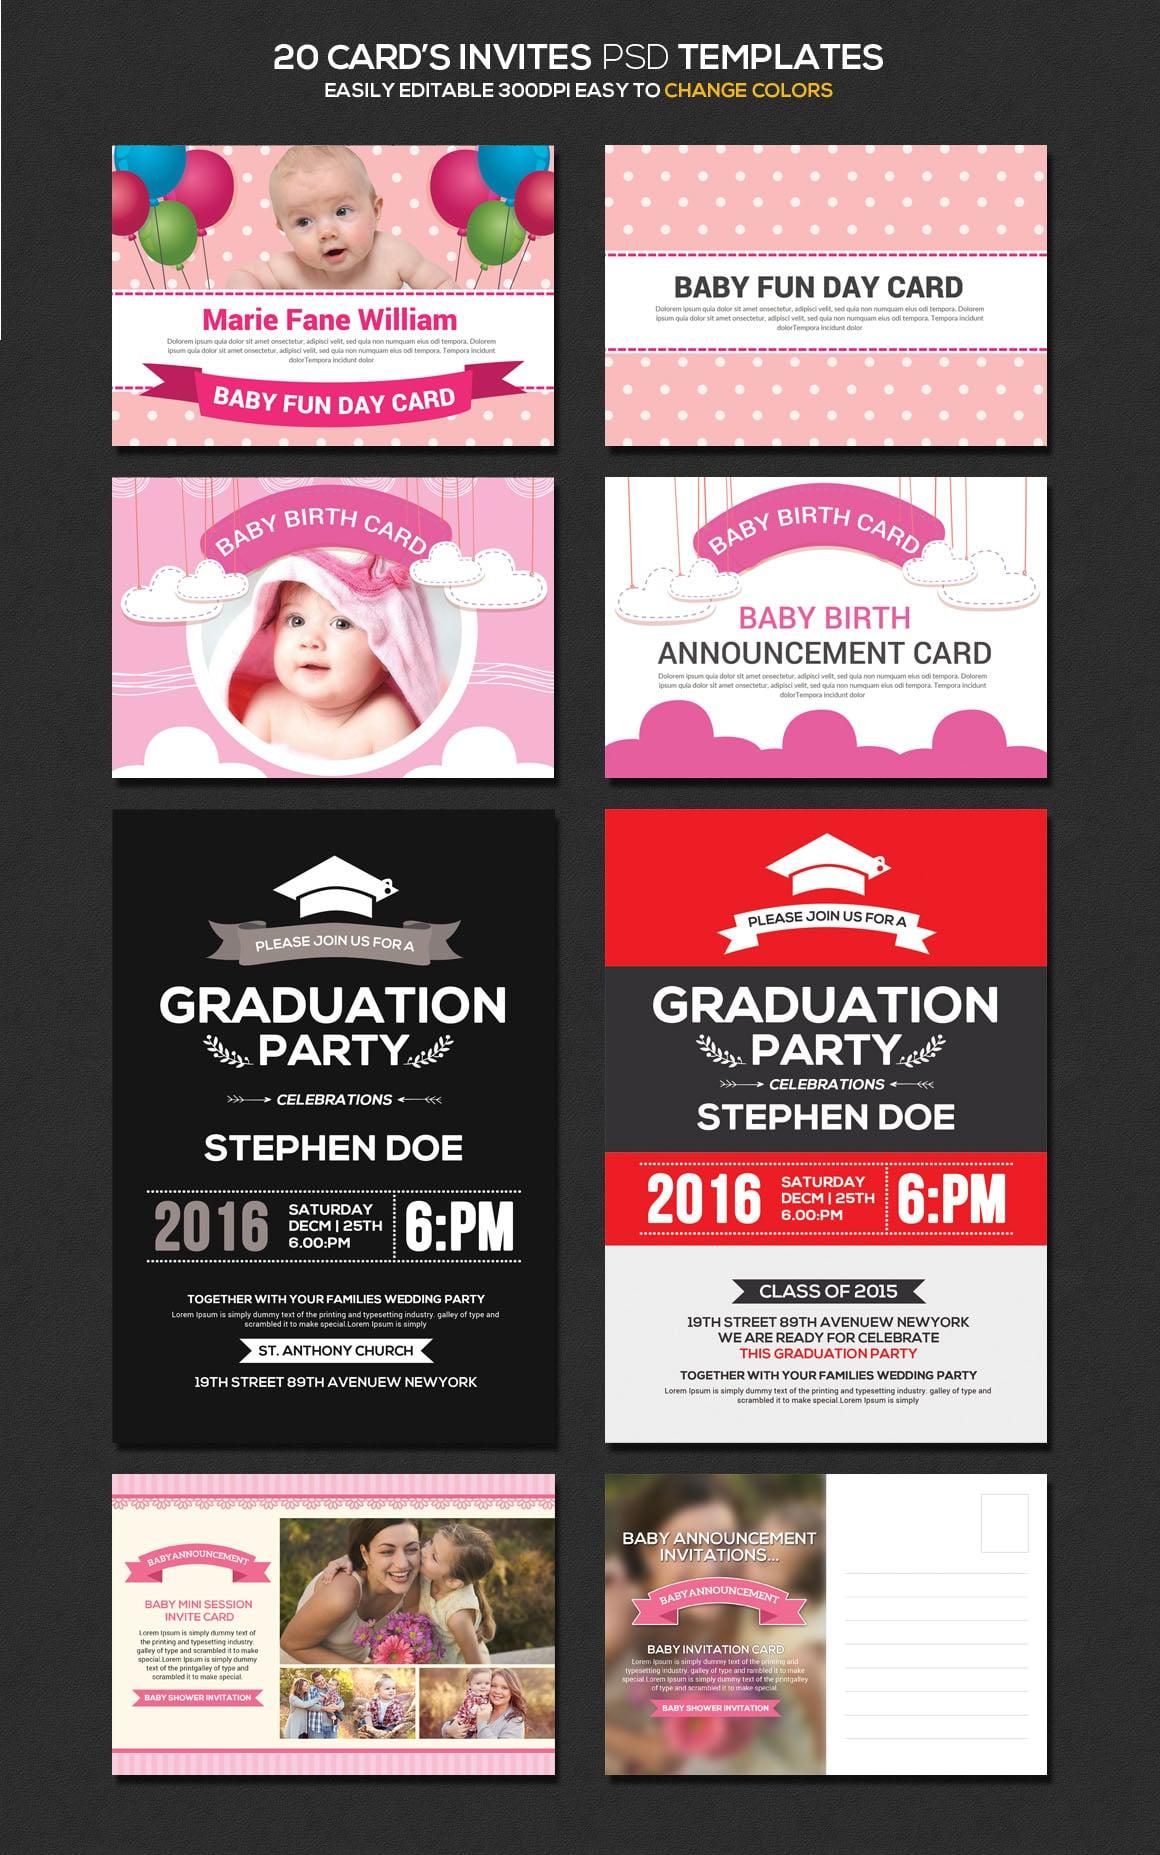 20 Invite Cards PSD Templates